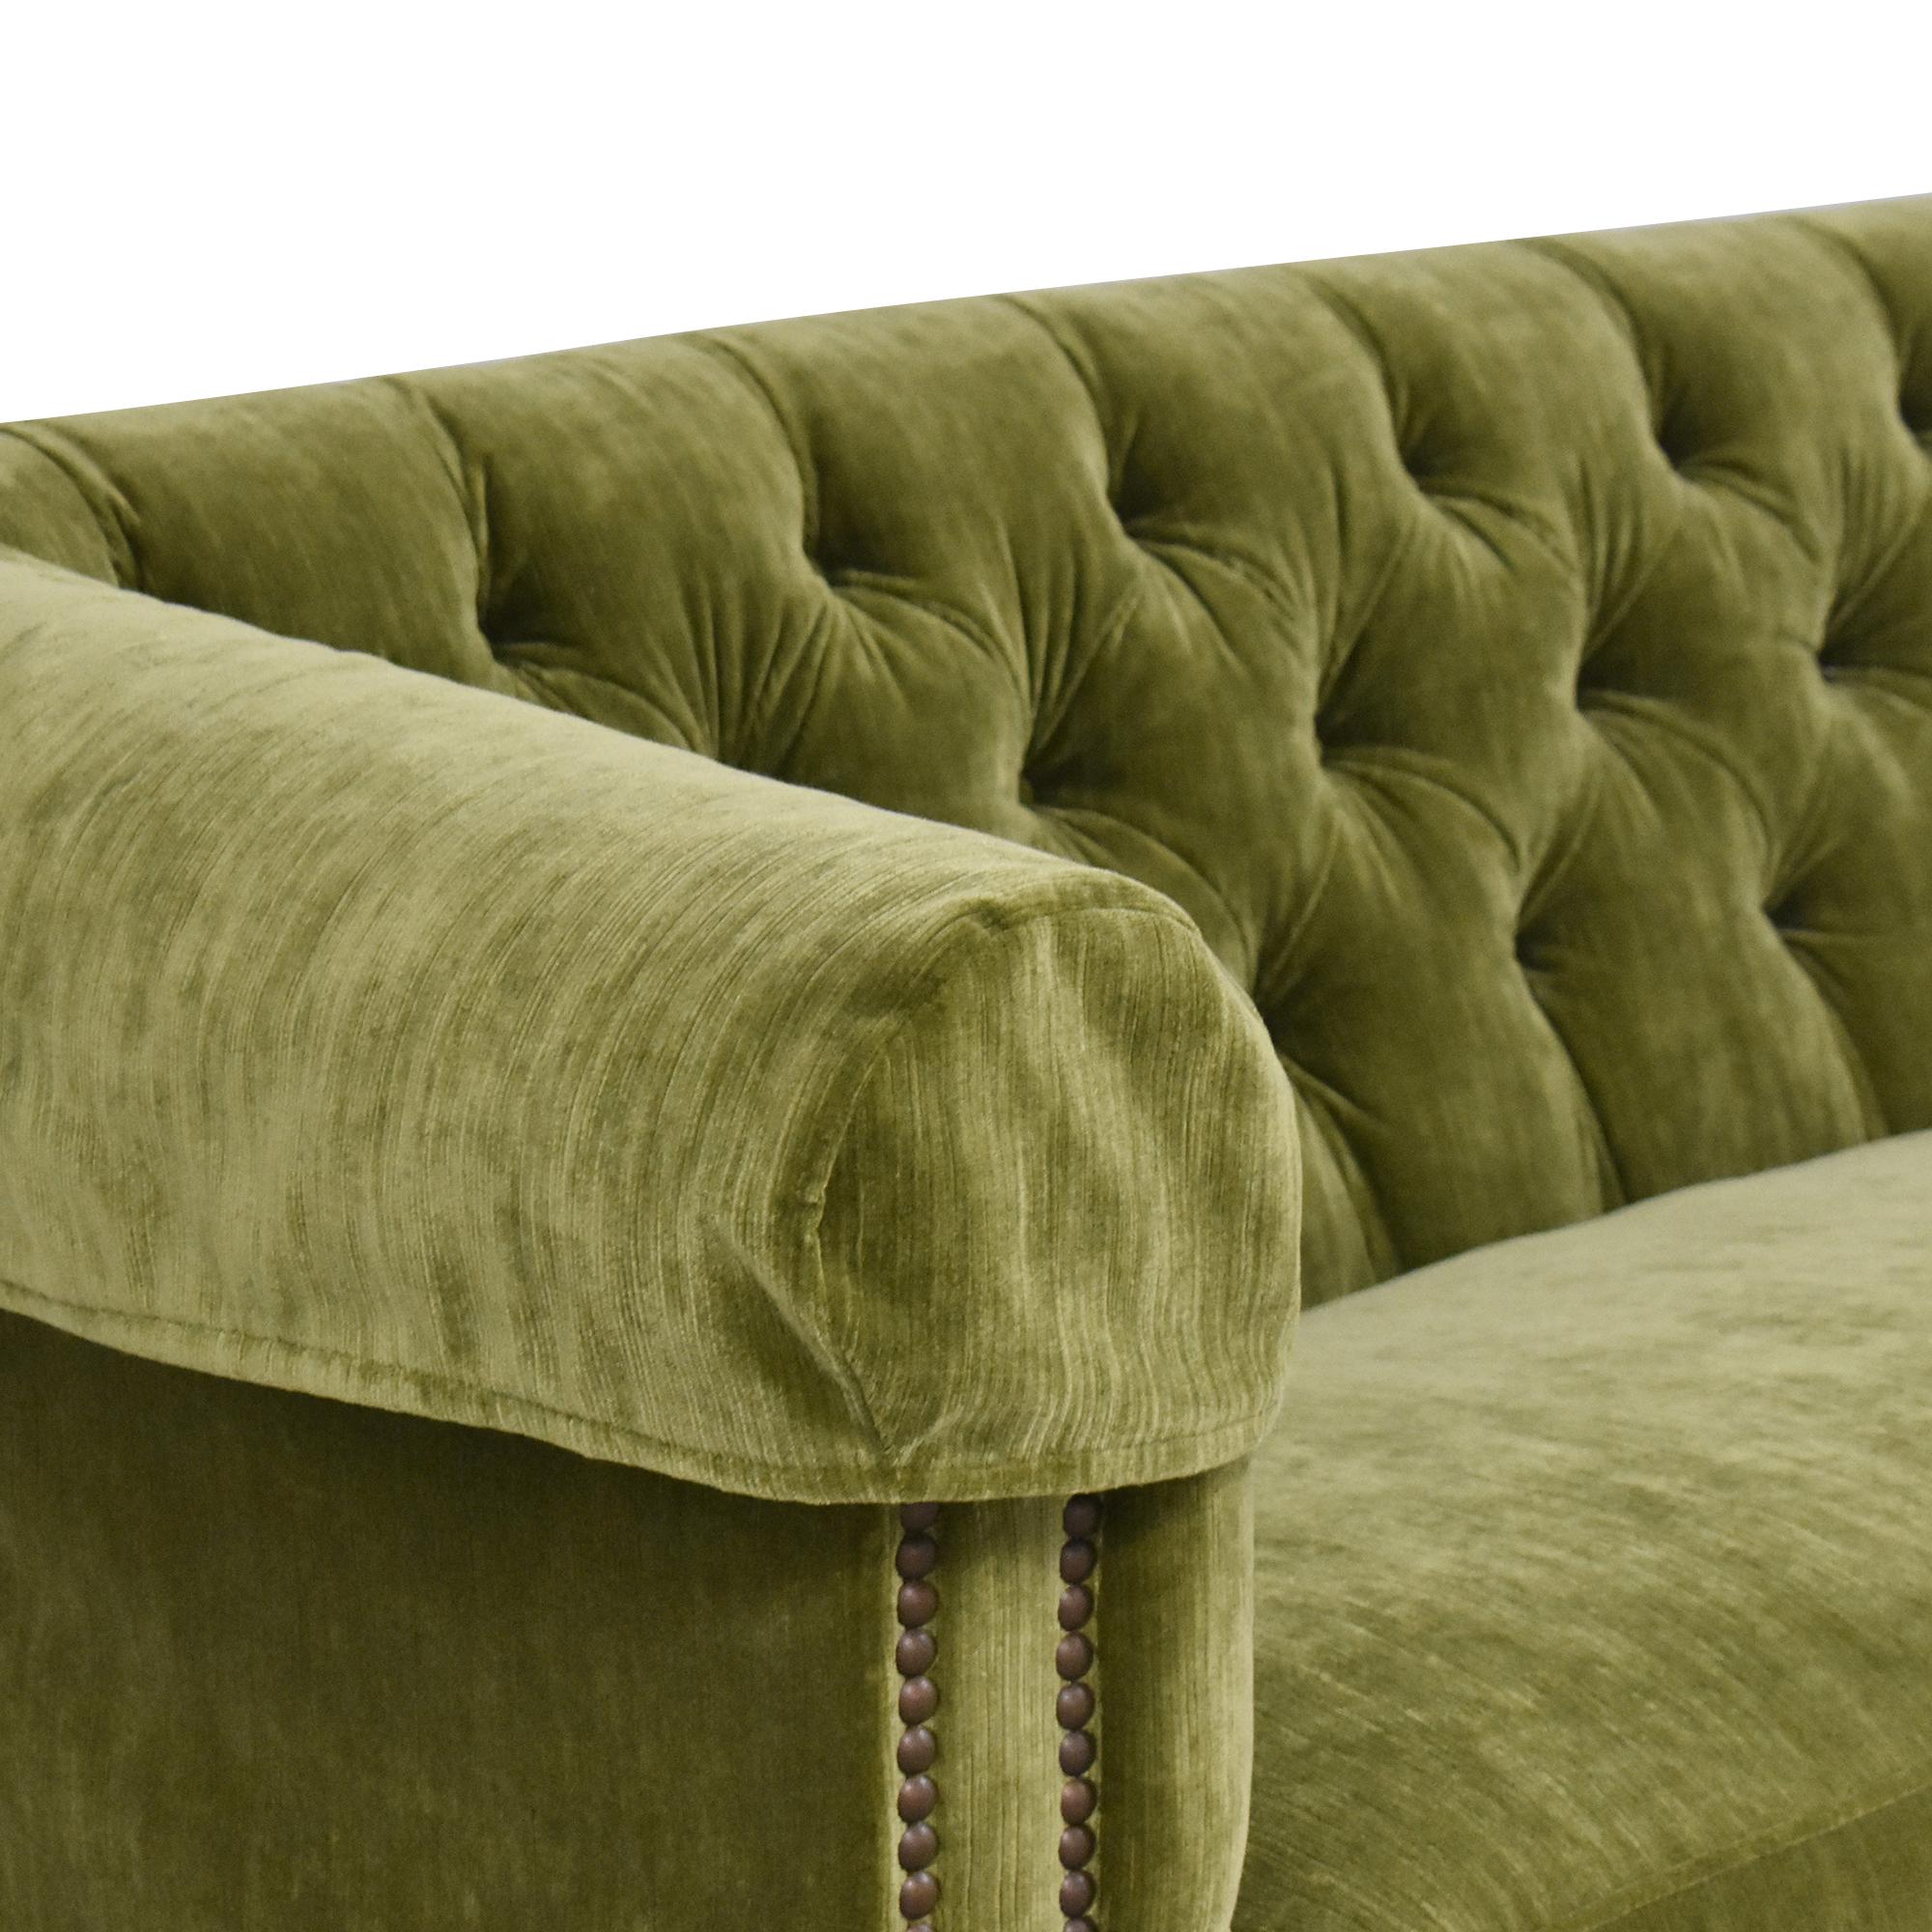 buy Lee Industries Custom Upholstered Chesterfield Sofa Lee Industries Classic Sofas